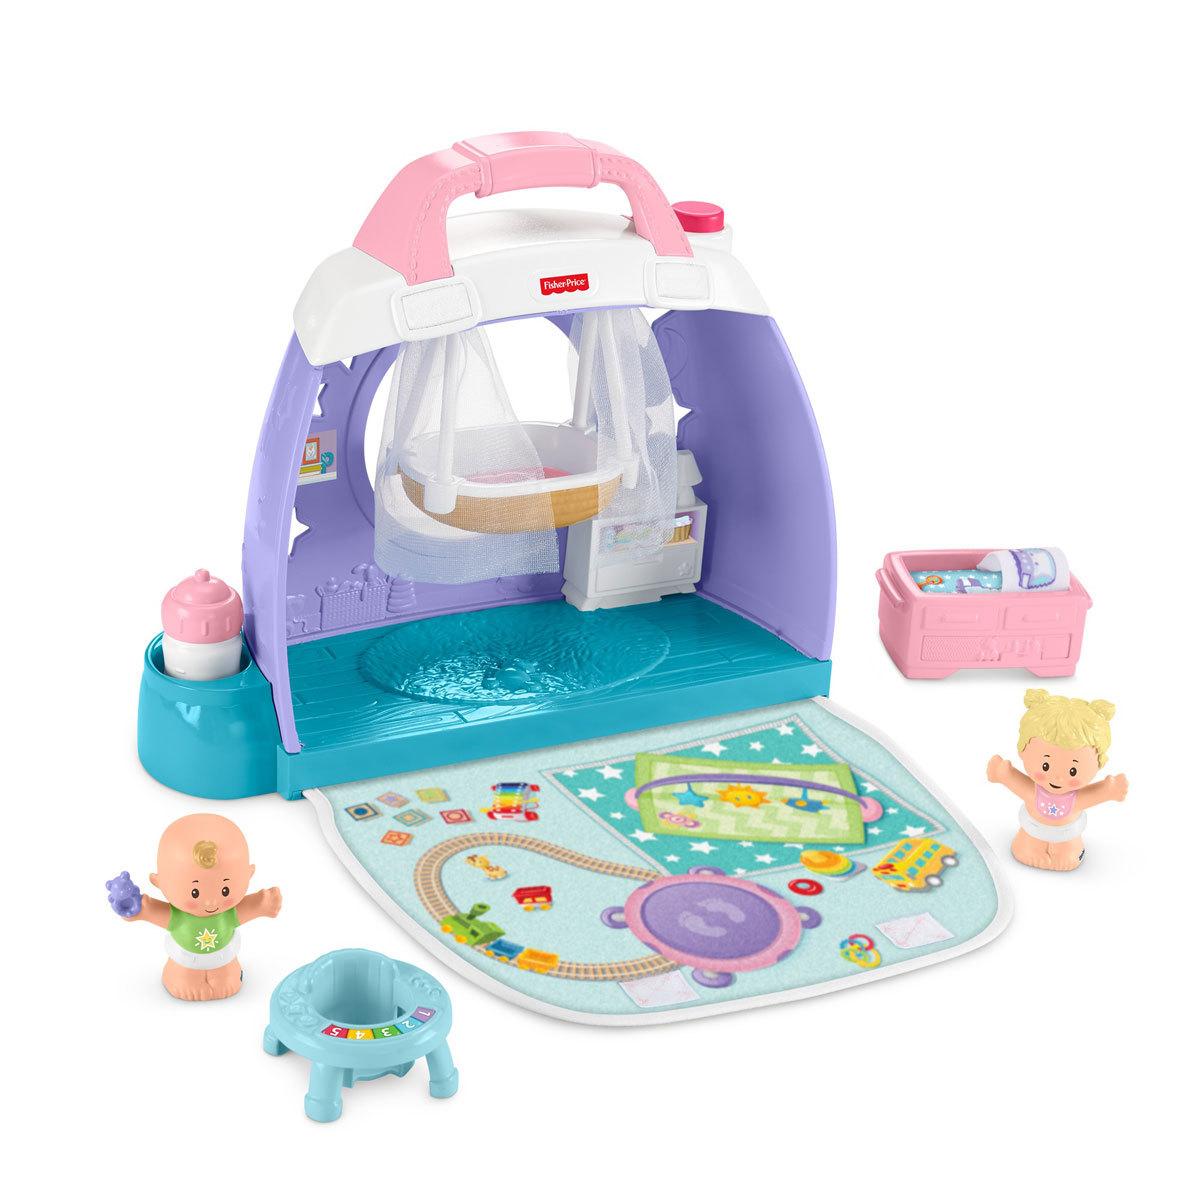 Fisher-Price Little People Cuddle & Play Nursey Playset